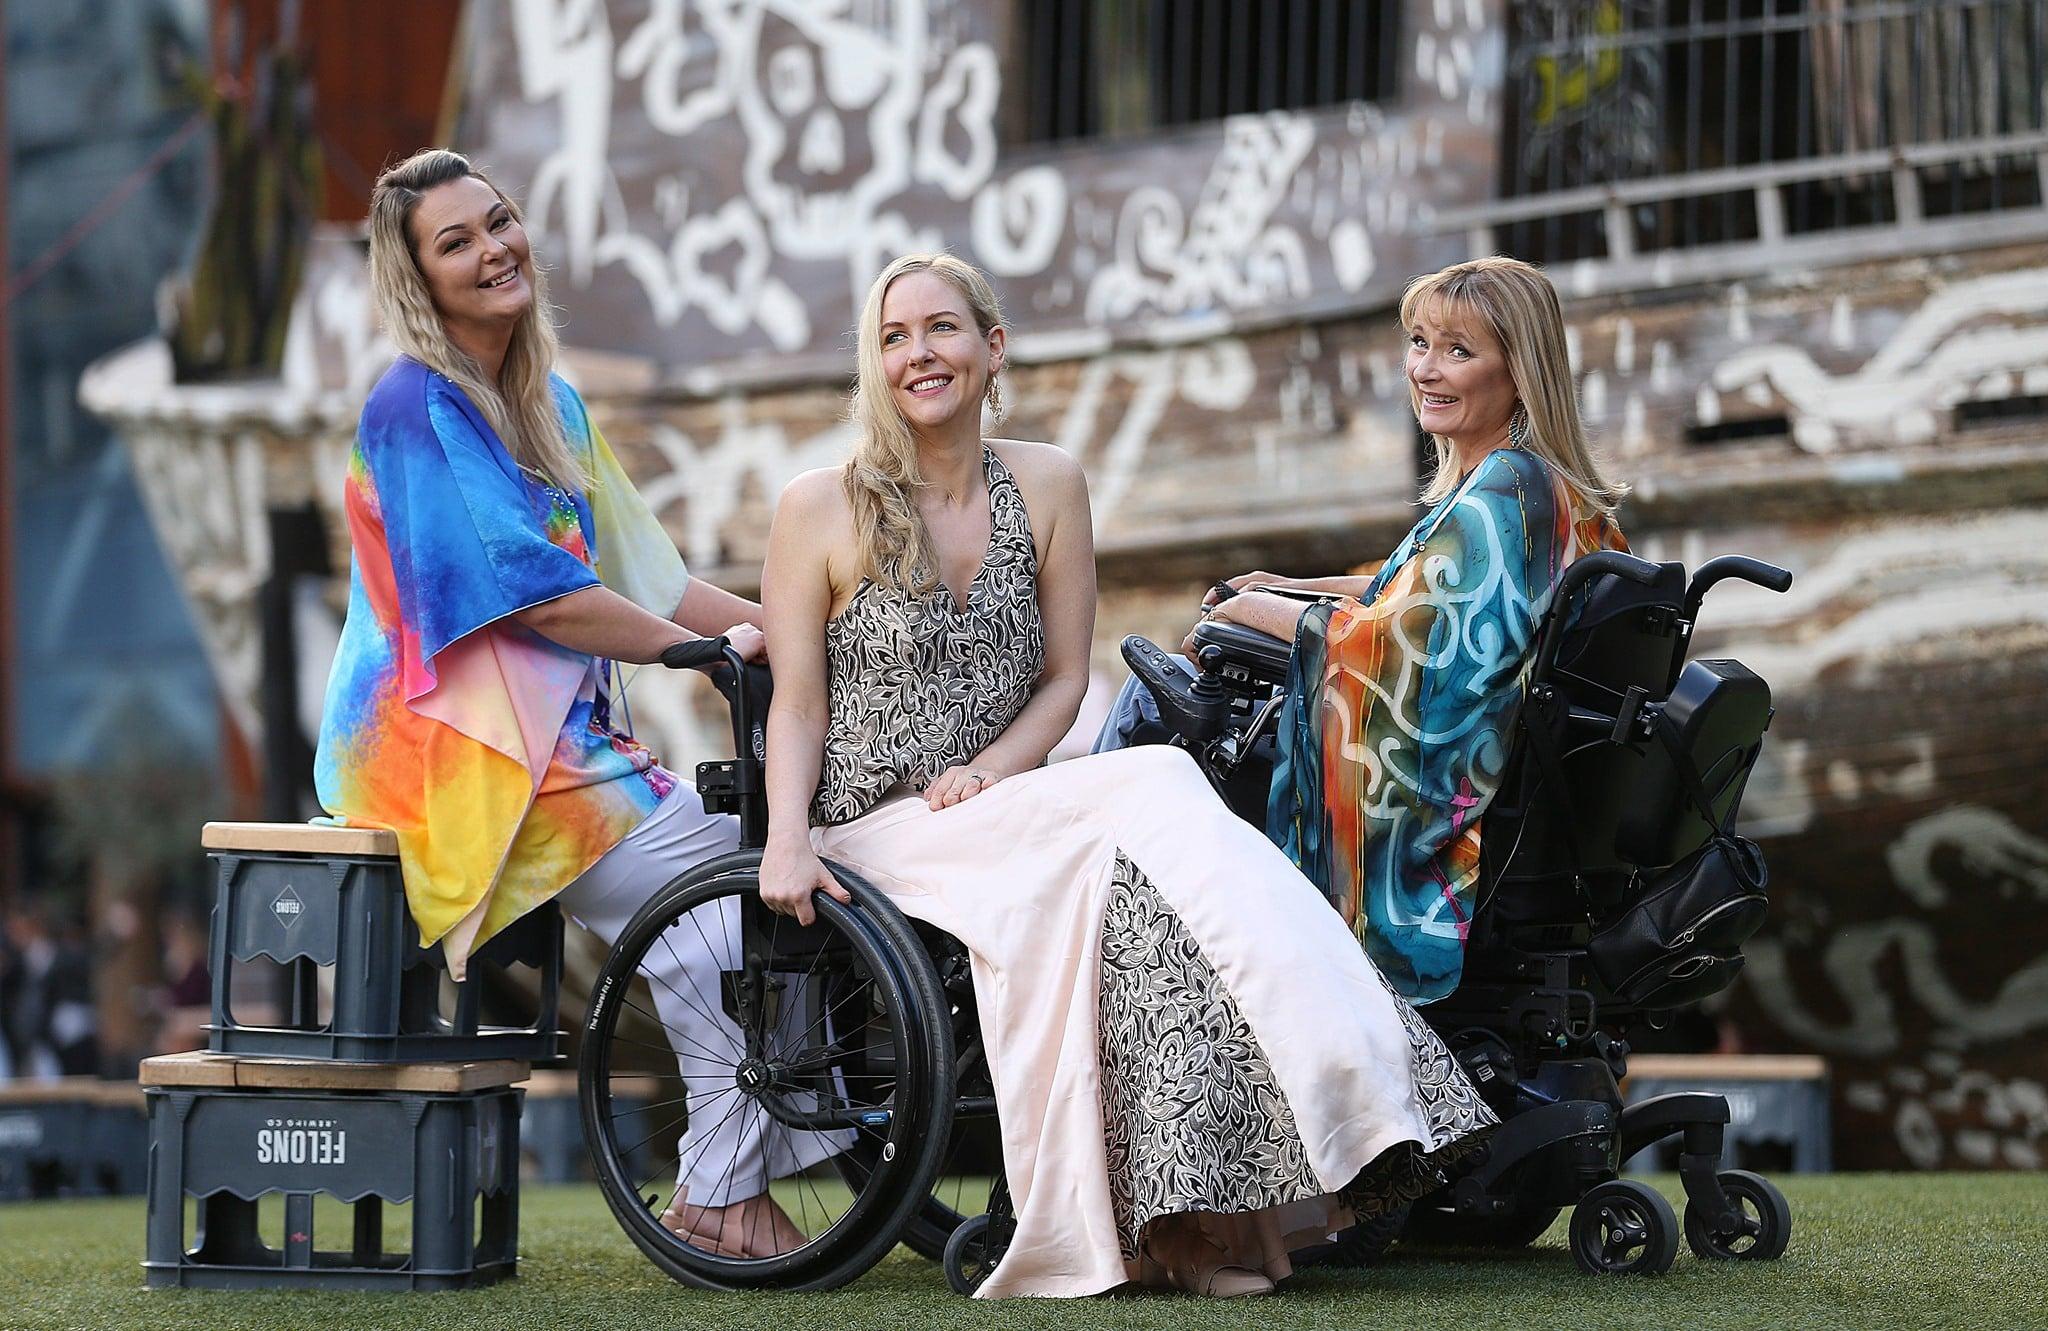 Carol showcases her quadriplegic clothing designs.